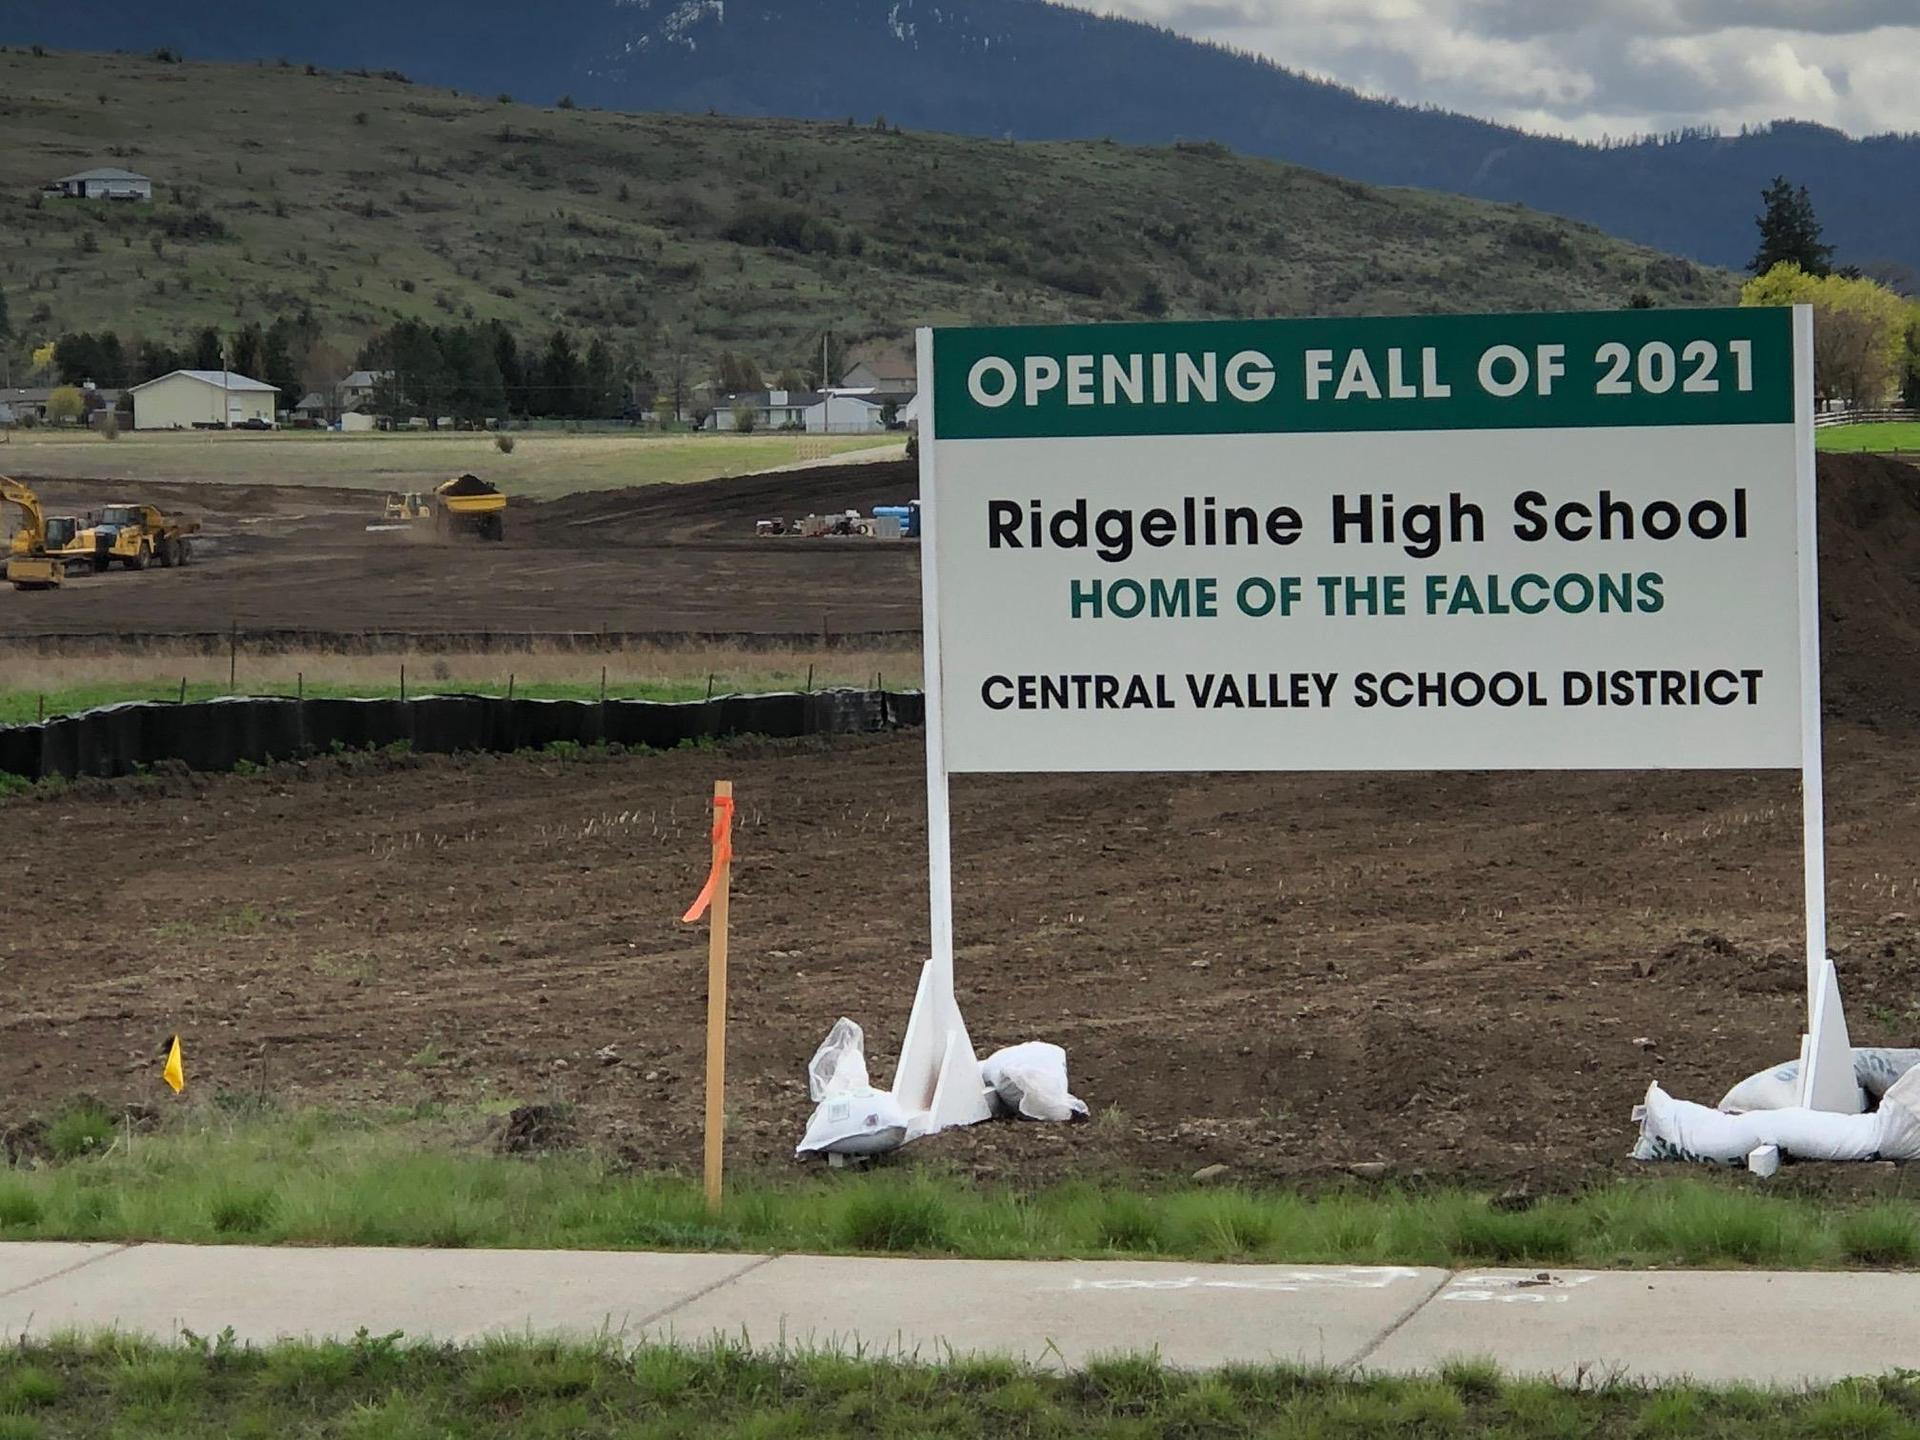 Ridgeline High School sign